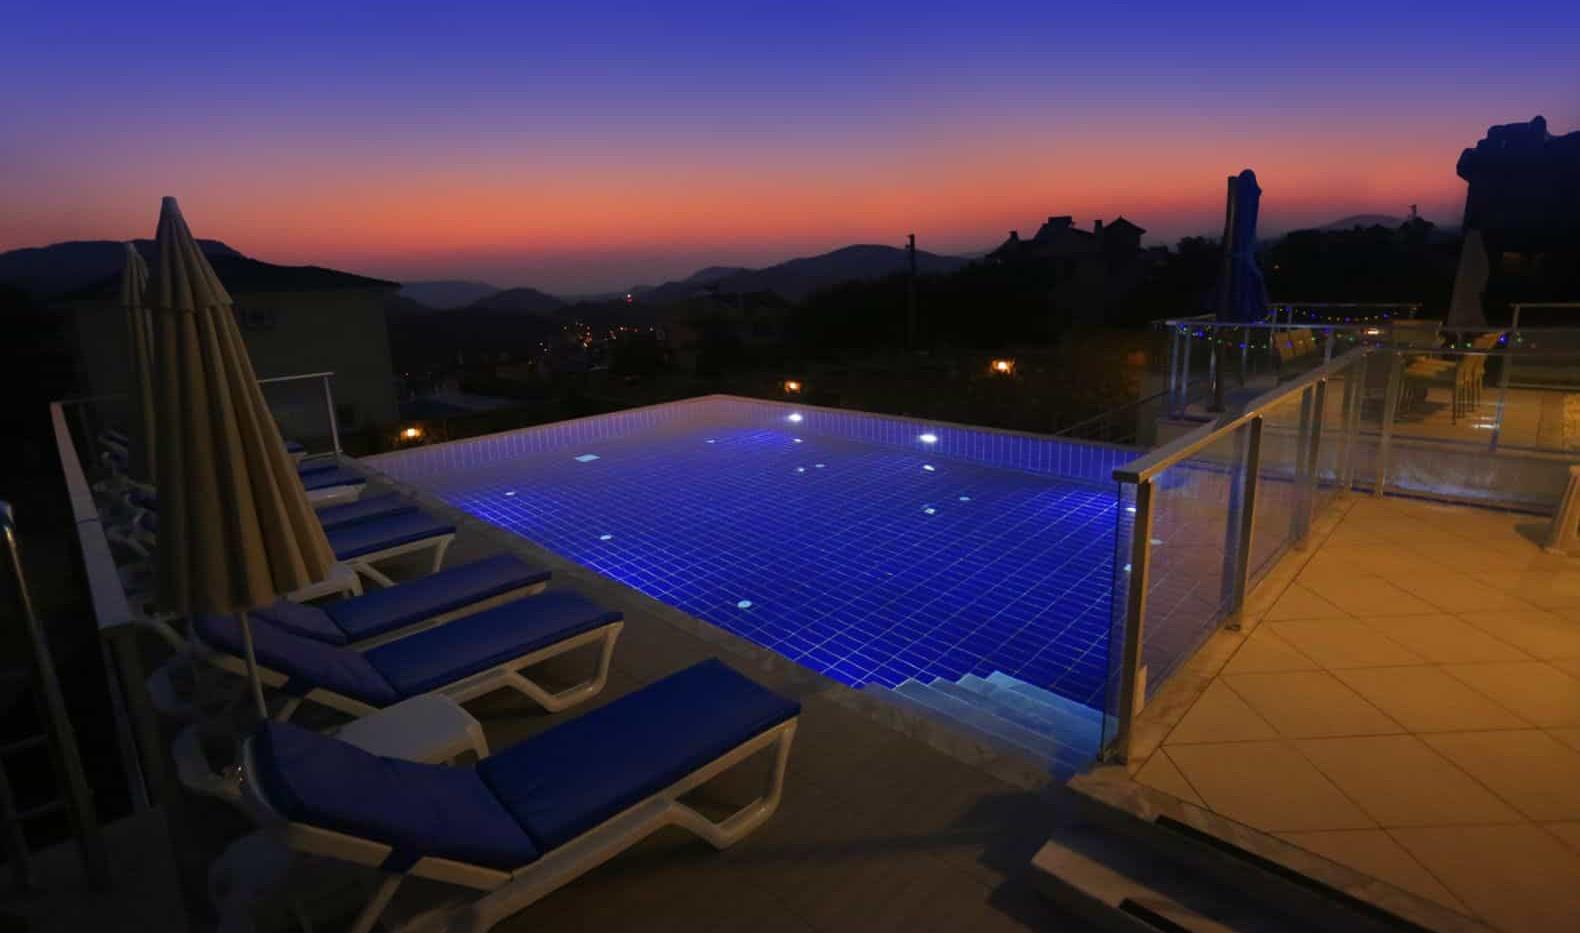 Sunset & Pool Lights